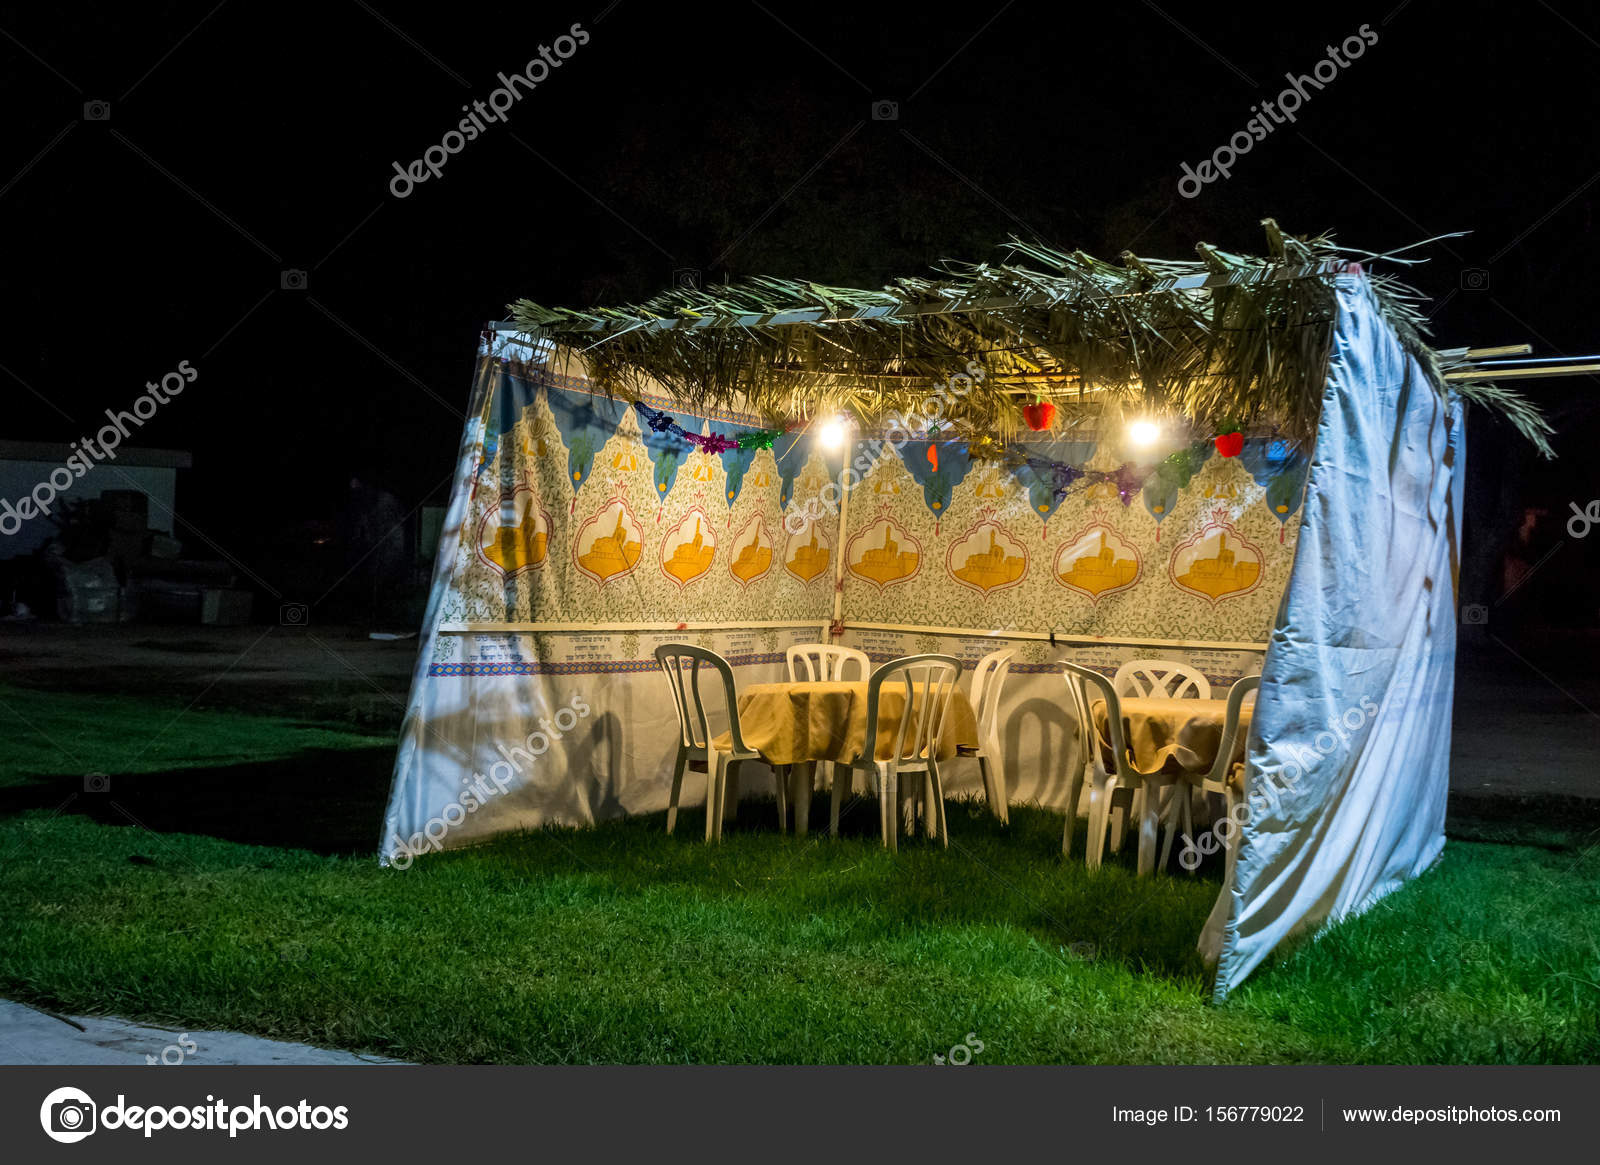 Sukkah - symbolic temporary hut for celebration of Jewish Holiday Sukkot u2014 Stock Photo & Sukkah - symbolic temporary hut for celebration of Jewish Holiday ...